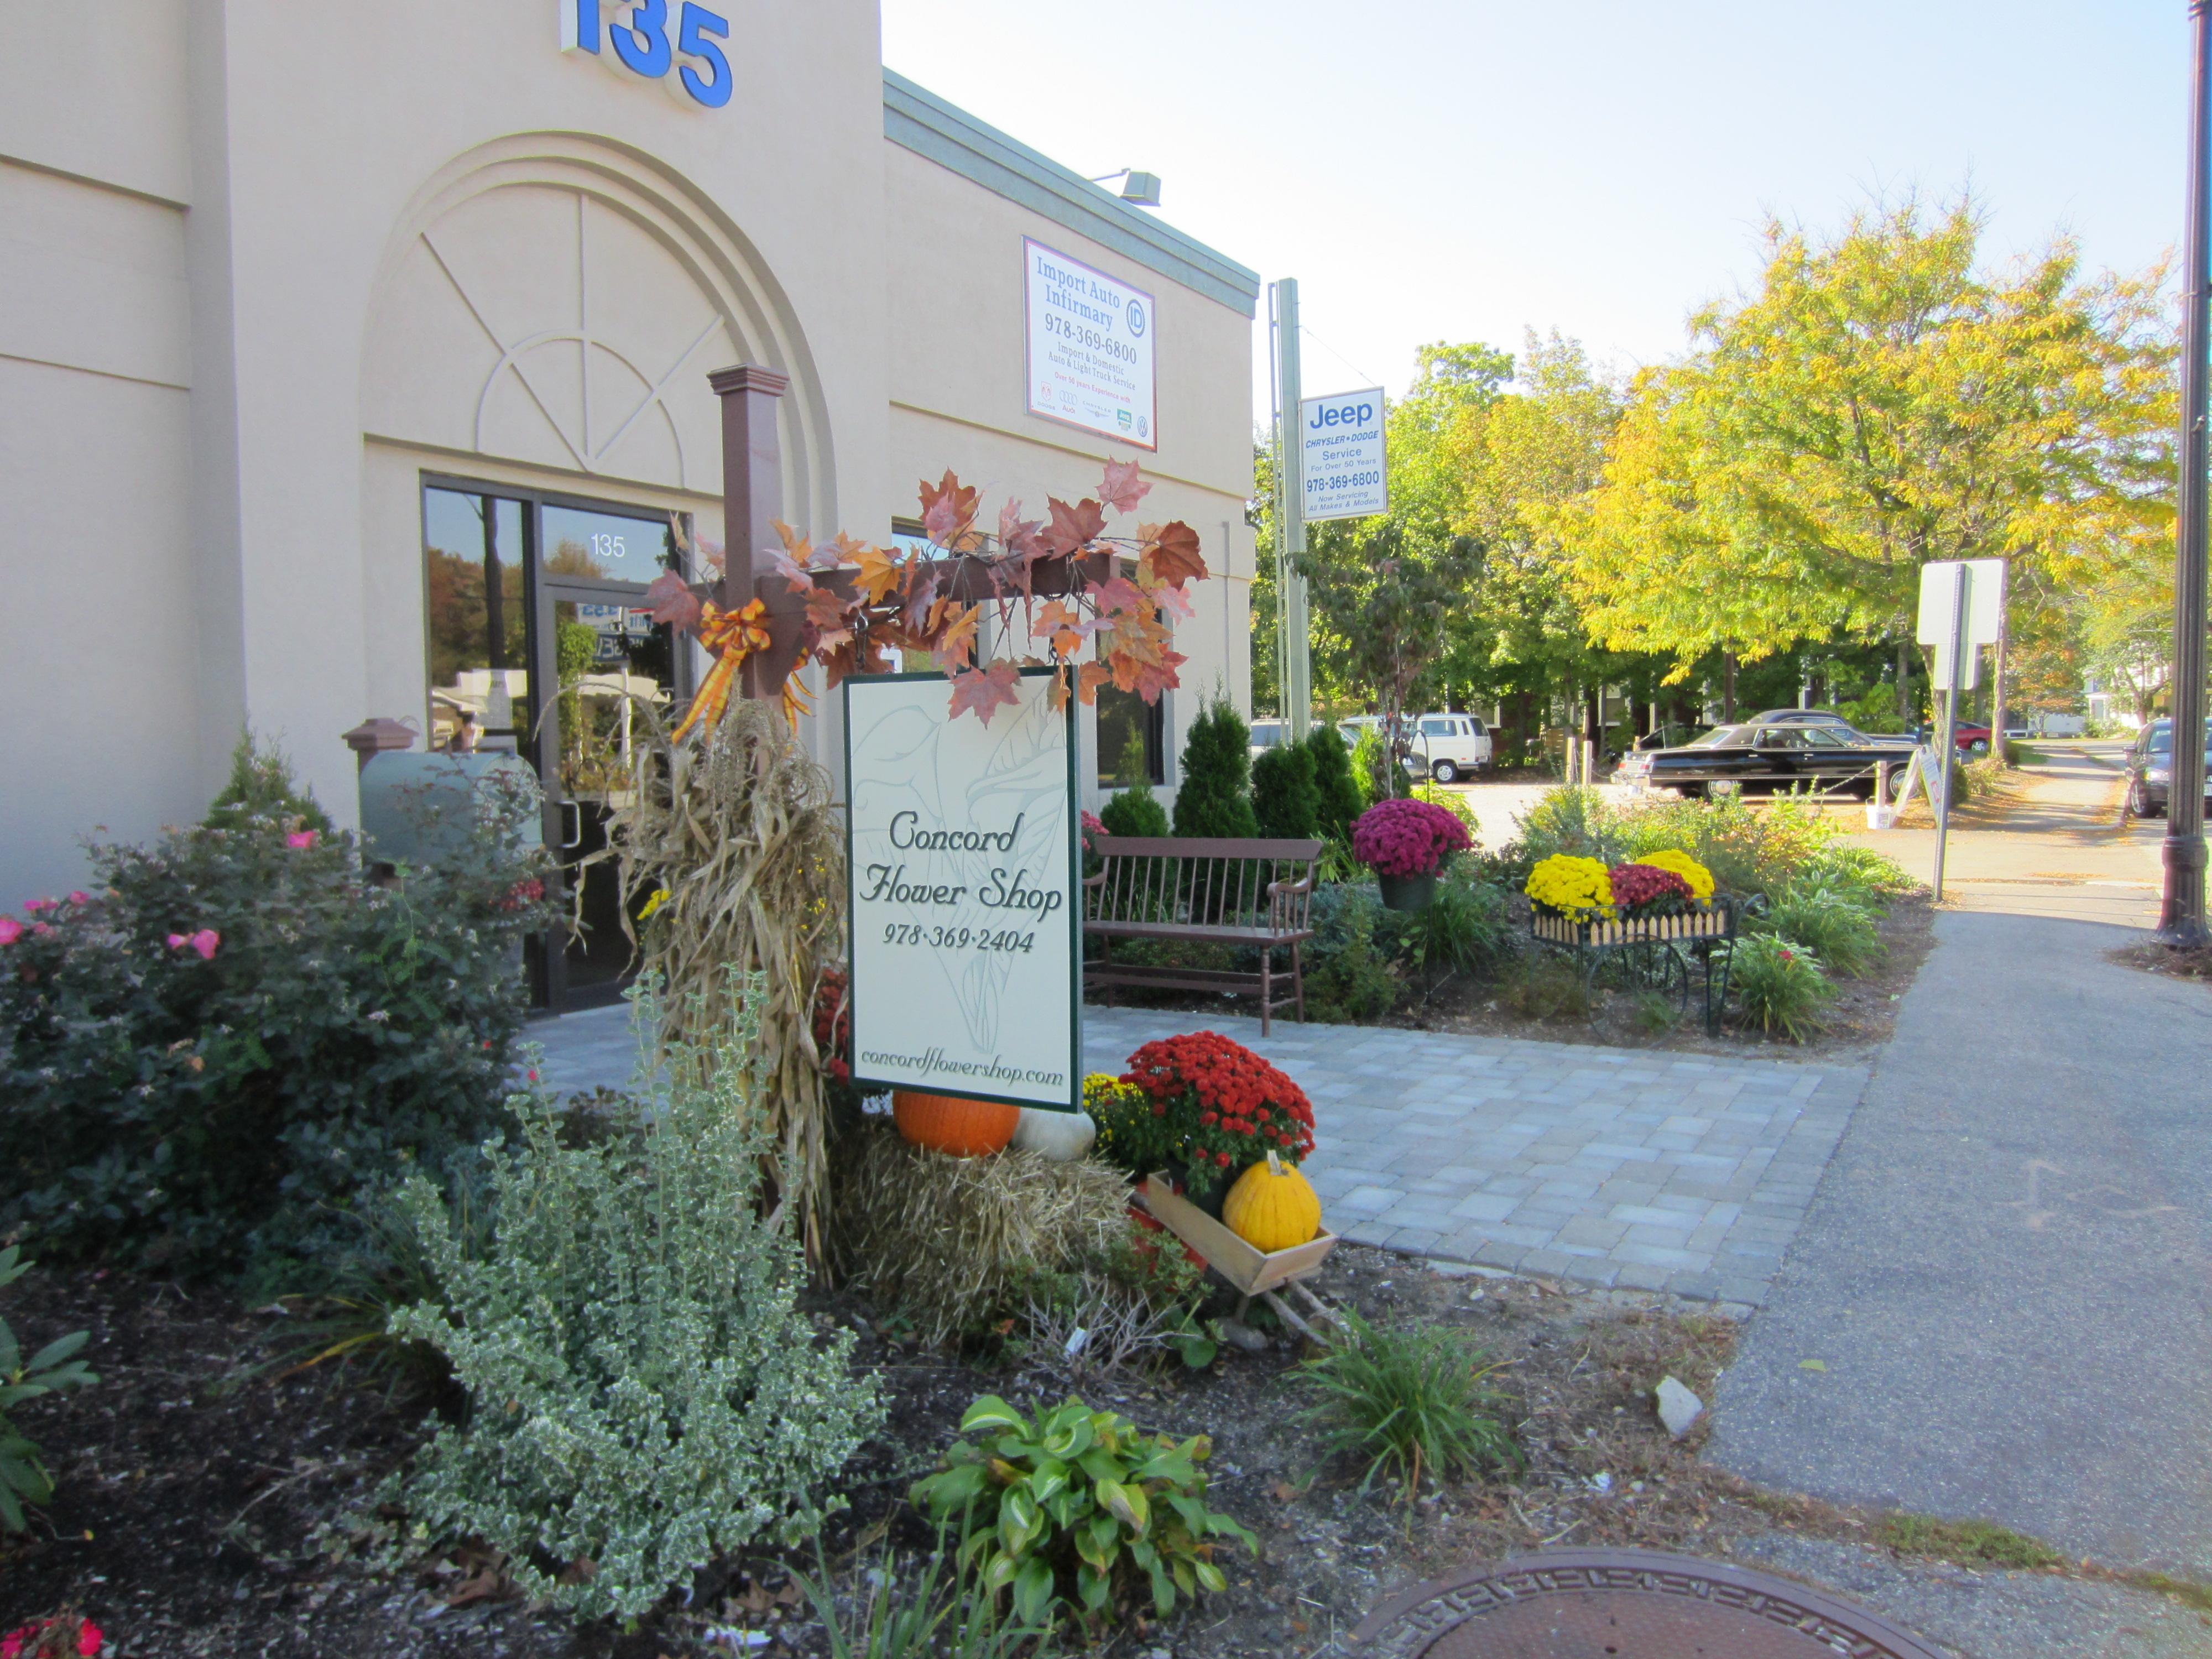 Concord Flower Shop image 4